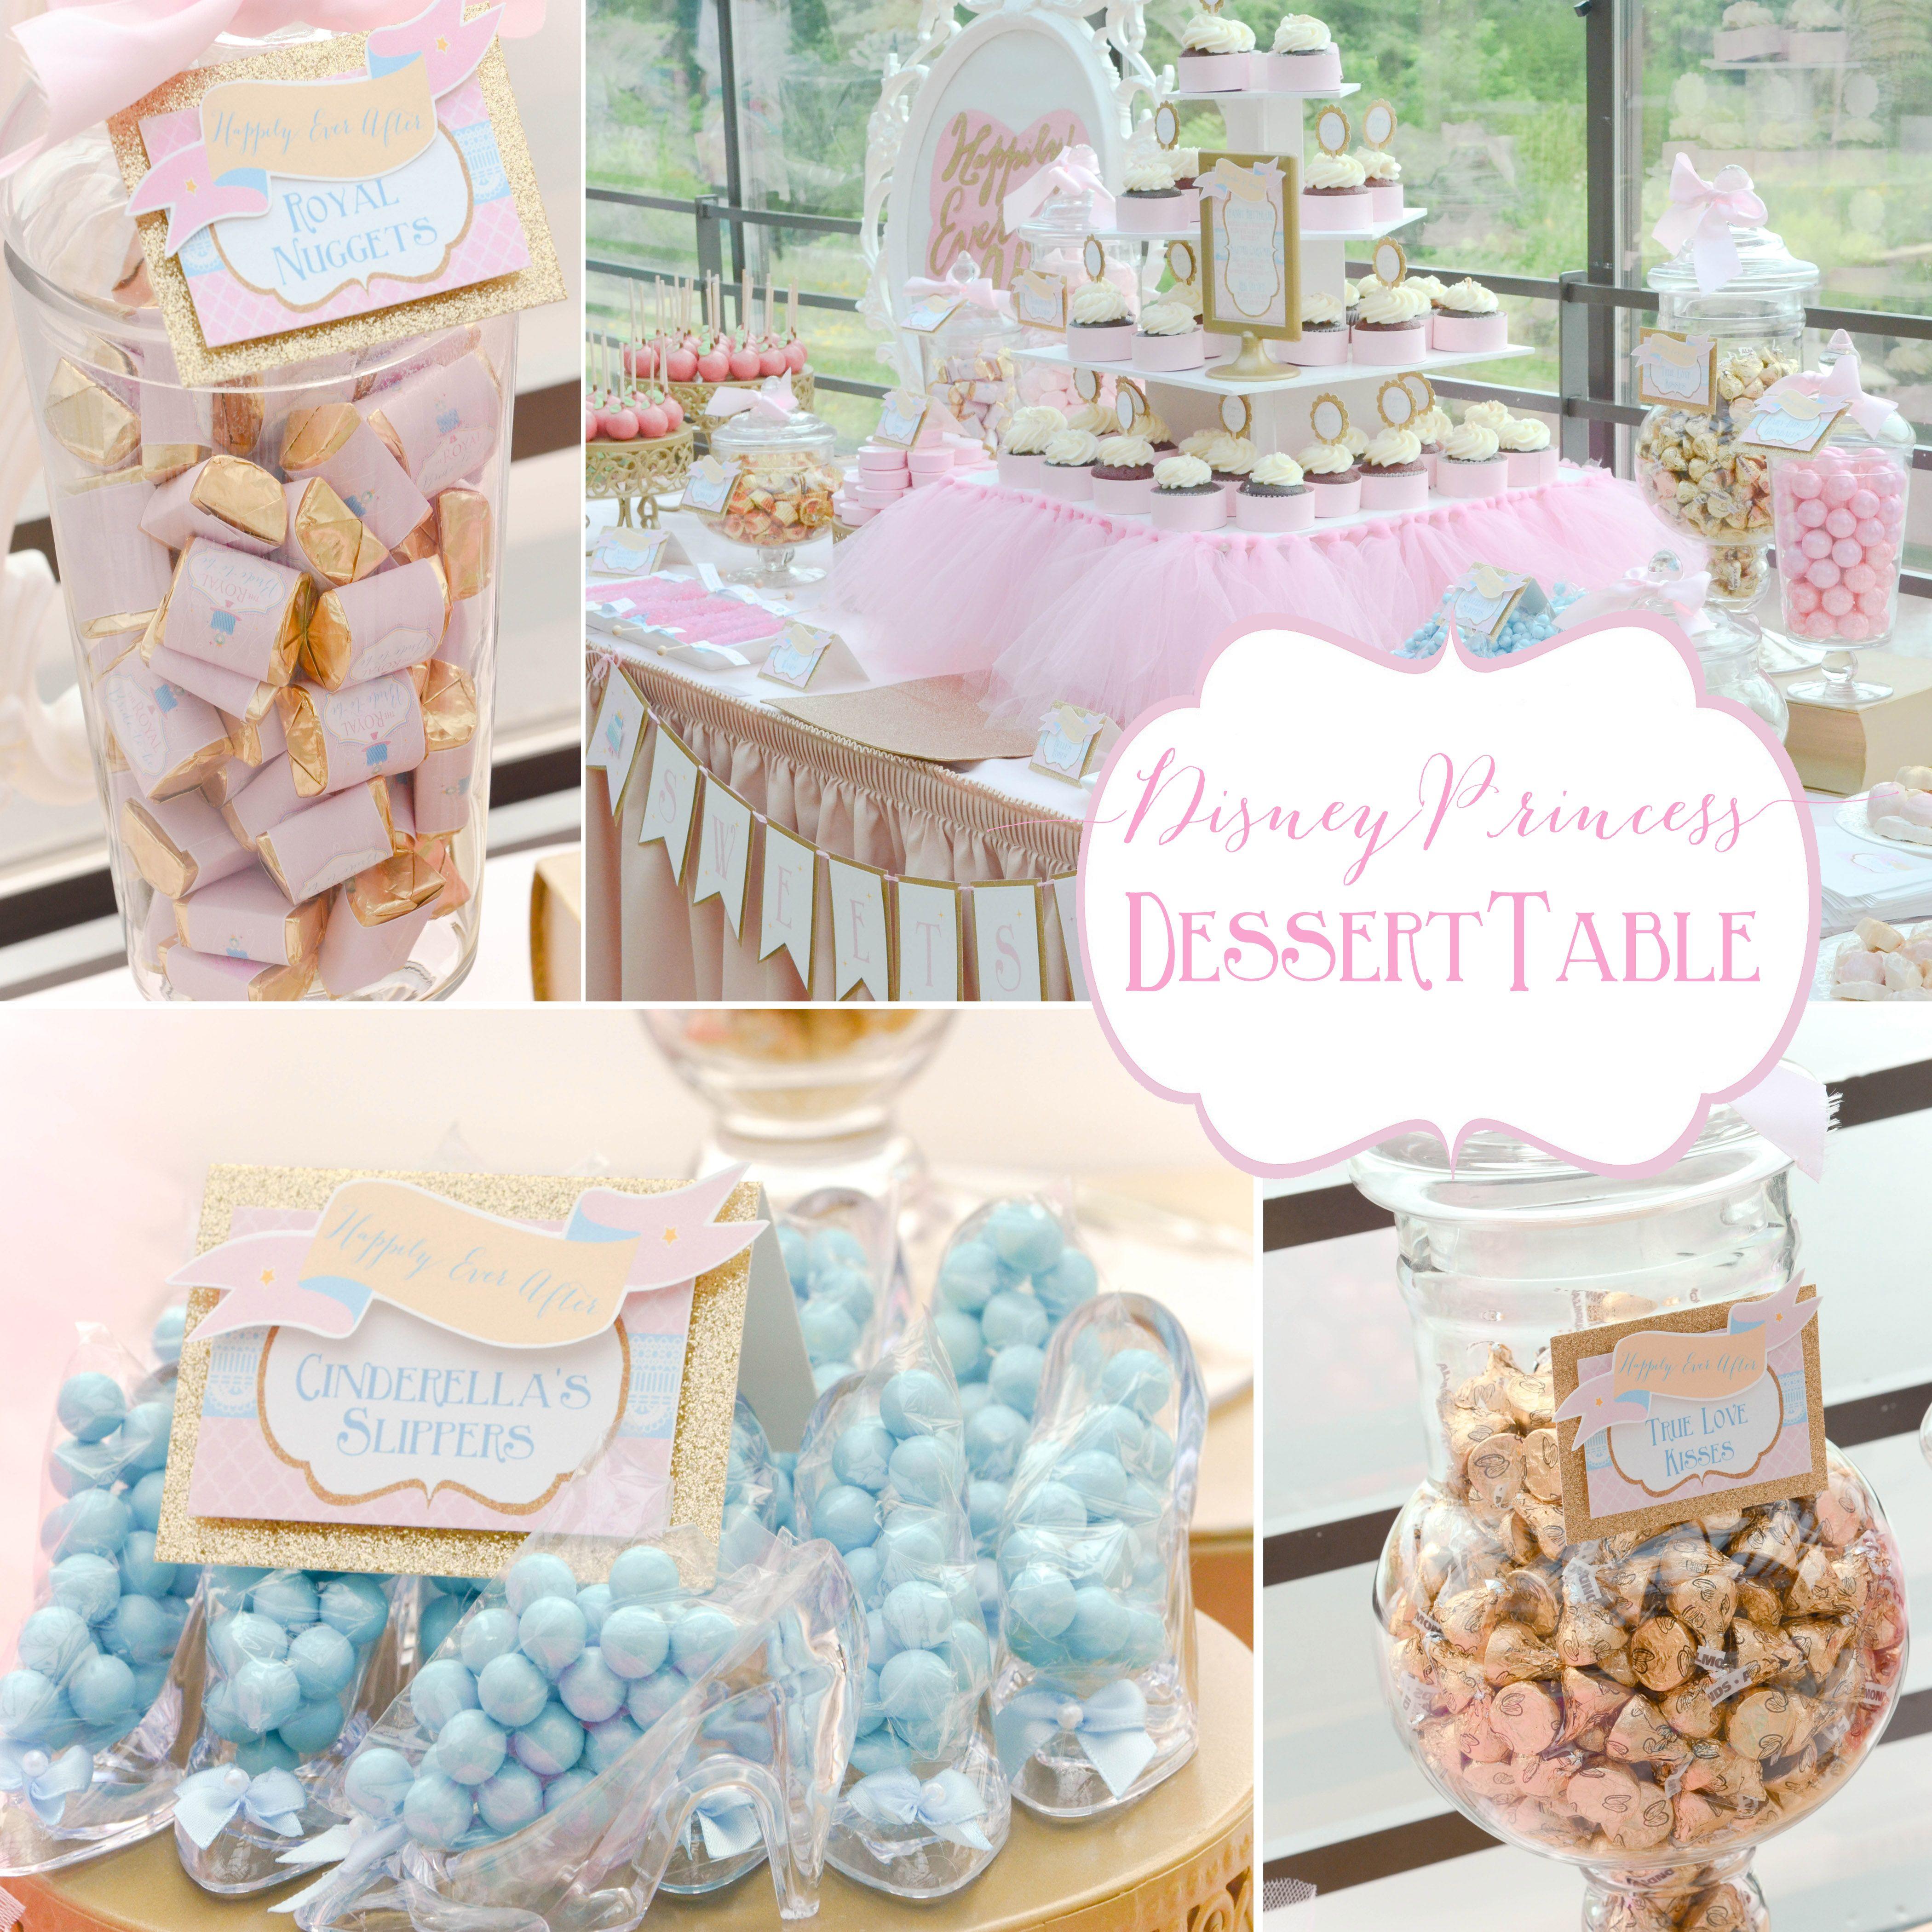 Bridal Shower Dessert Table Ideas nestleton waters inn wedding from mango studios bridal shower dessertswedding dessert tableswedding Dessert Table